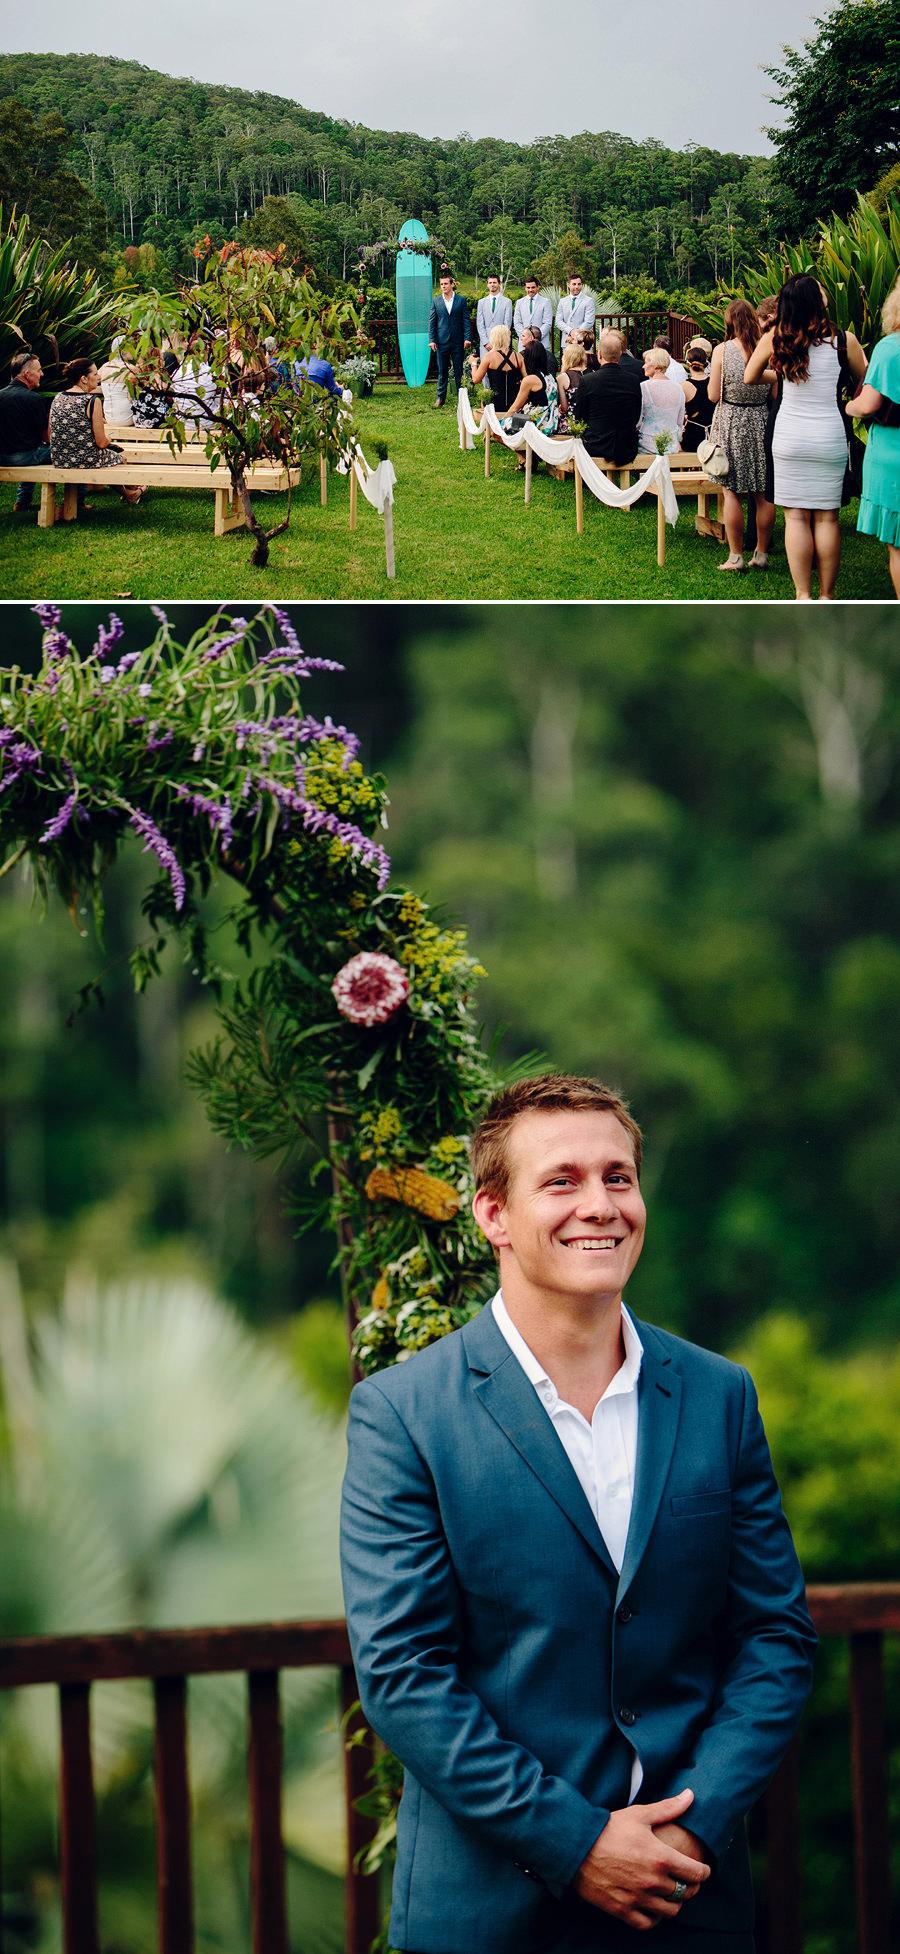 Coffs Harbour Wedding Photography: Ceremony